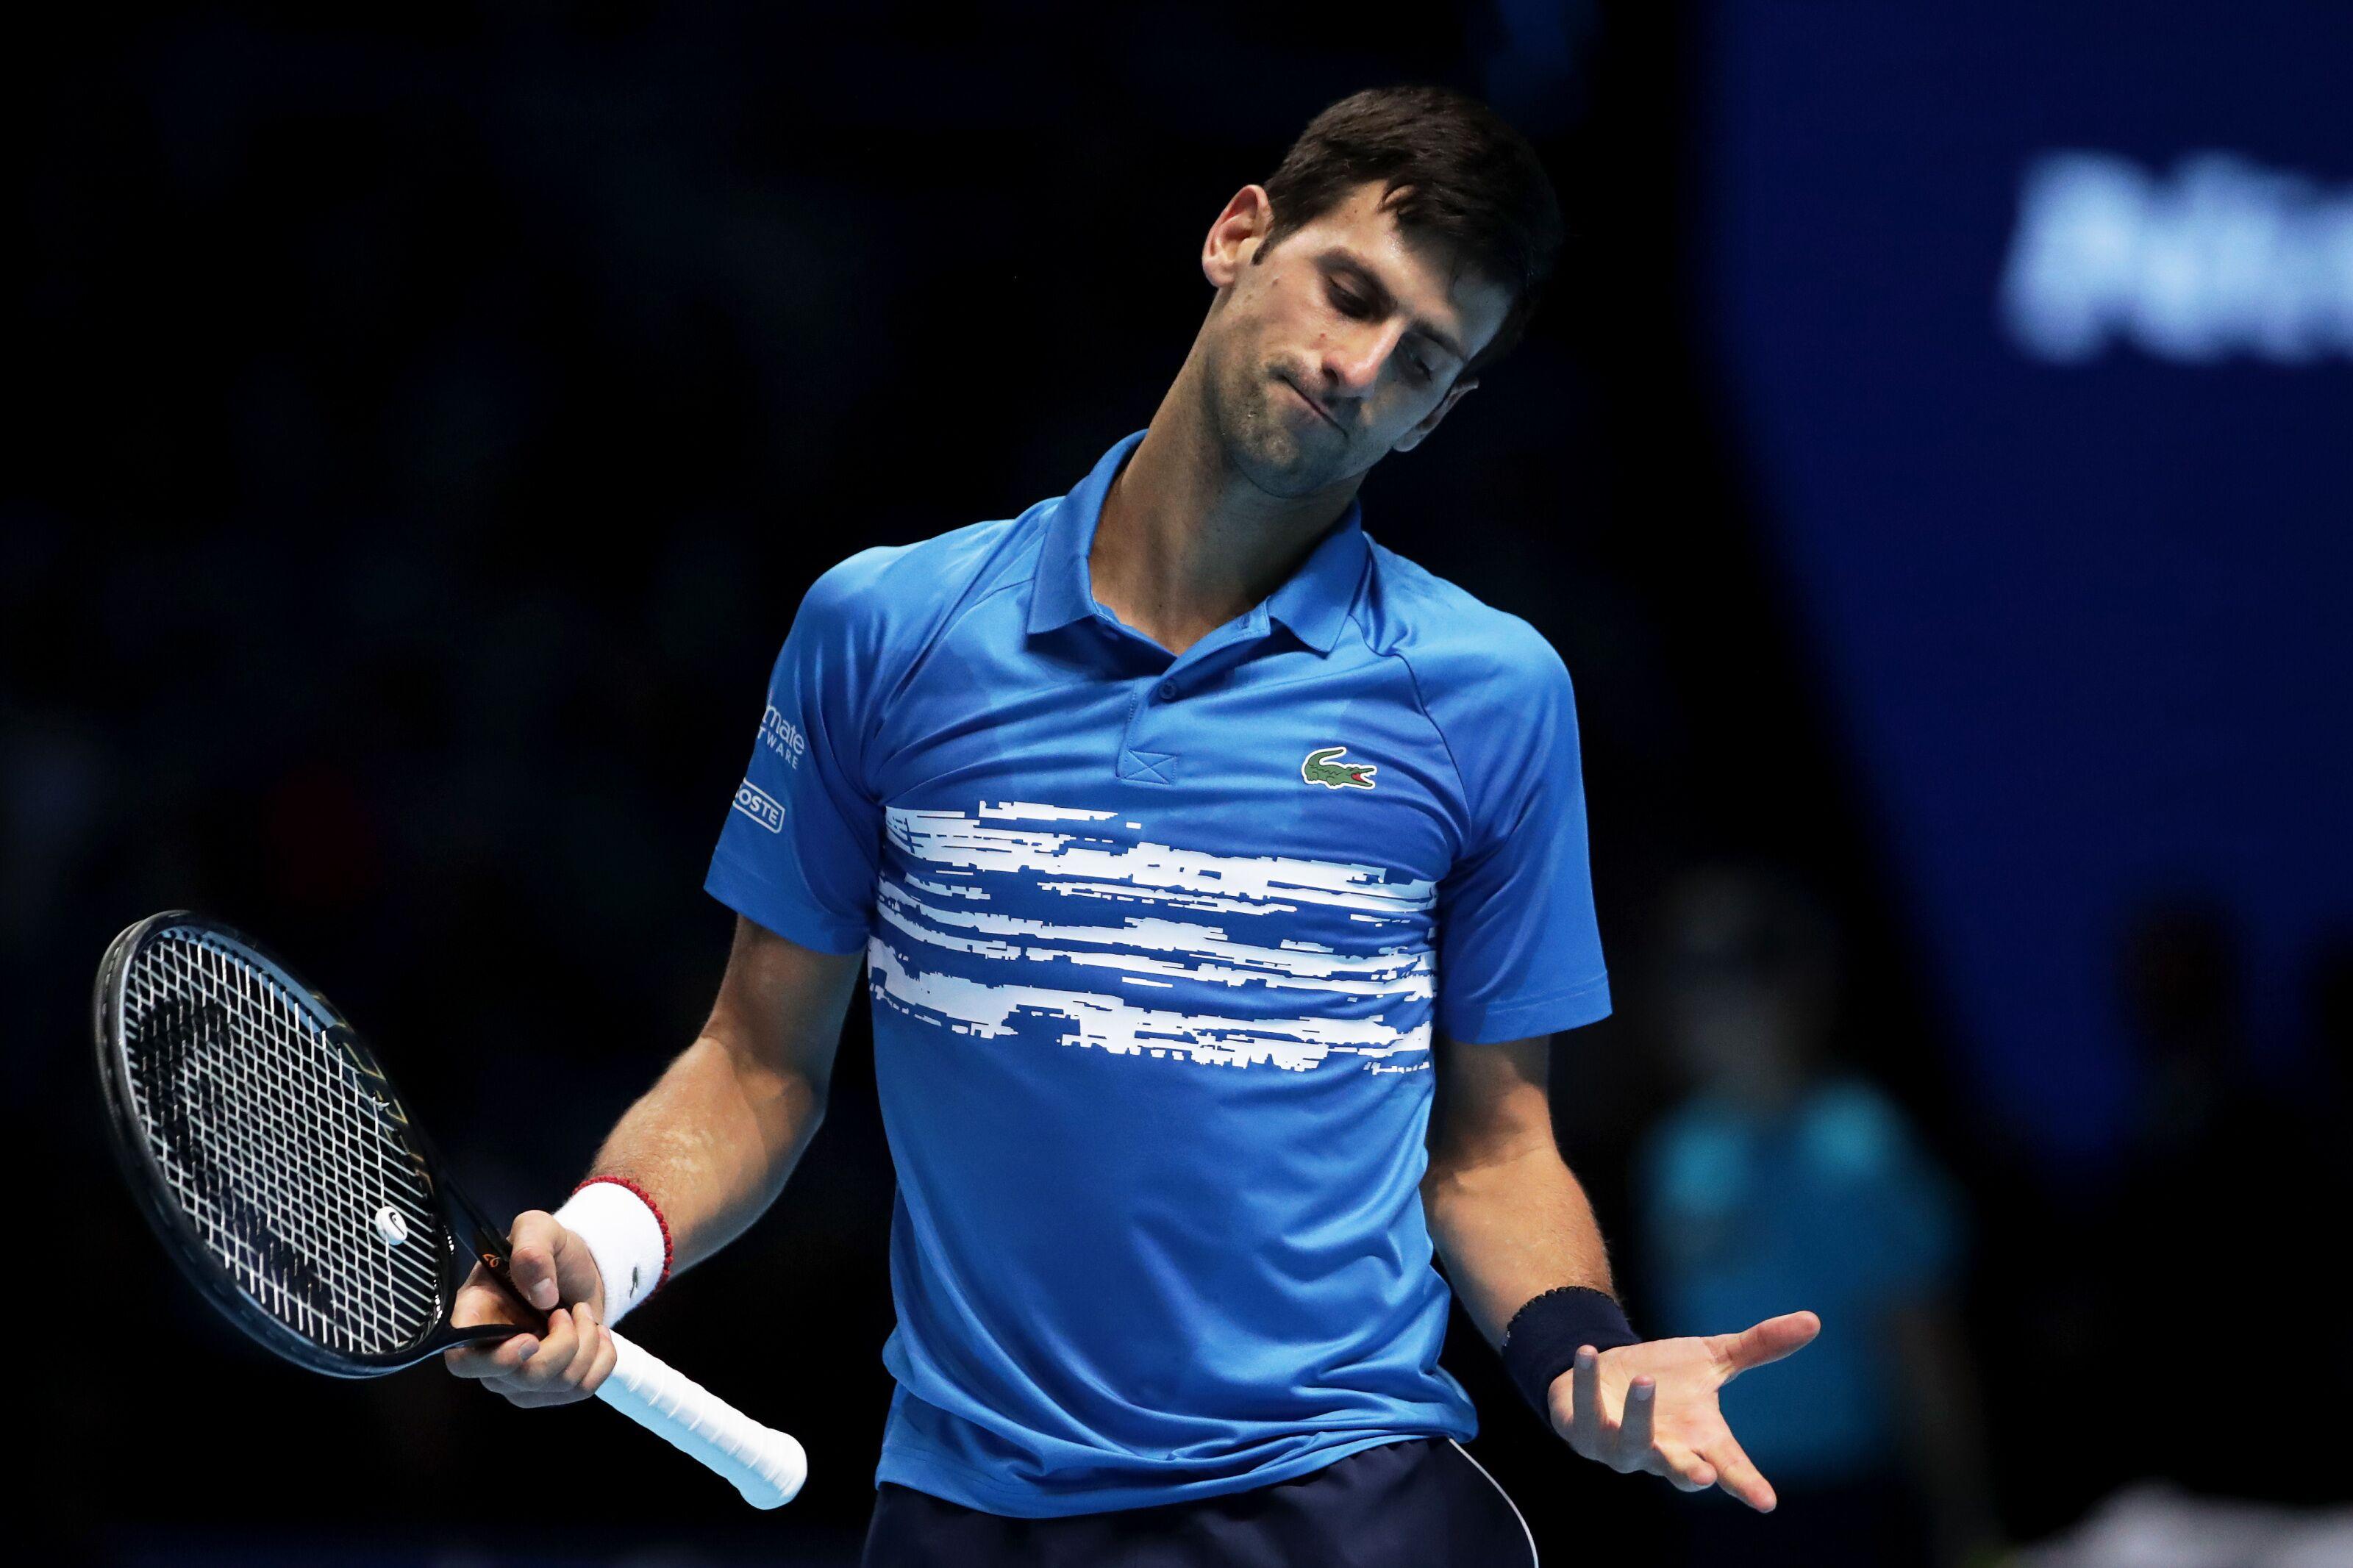 Australian Open 2020 The Case Against Novak Djokovic Being